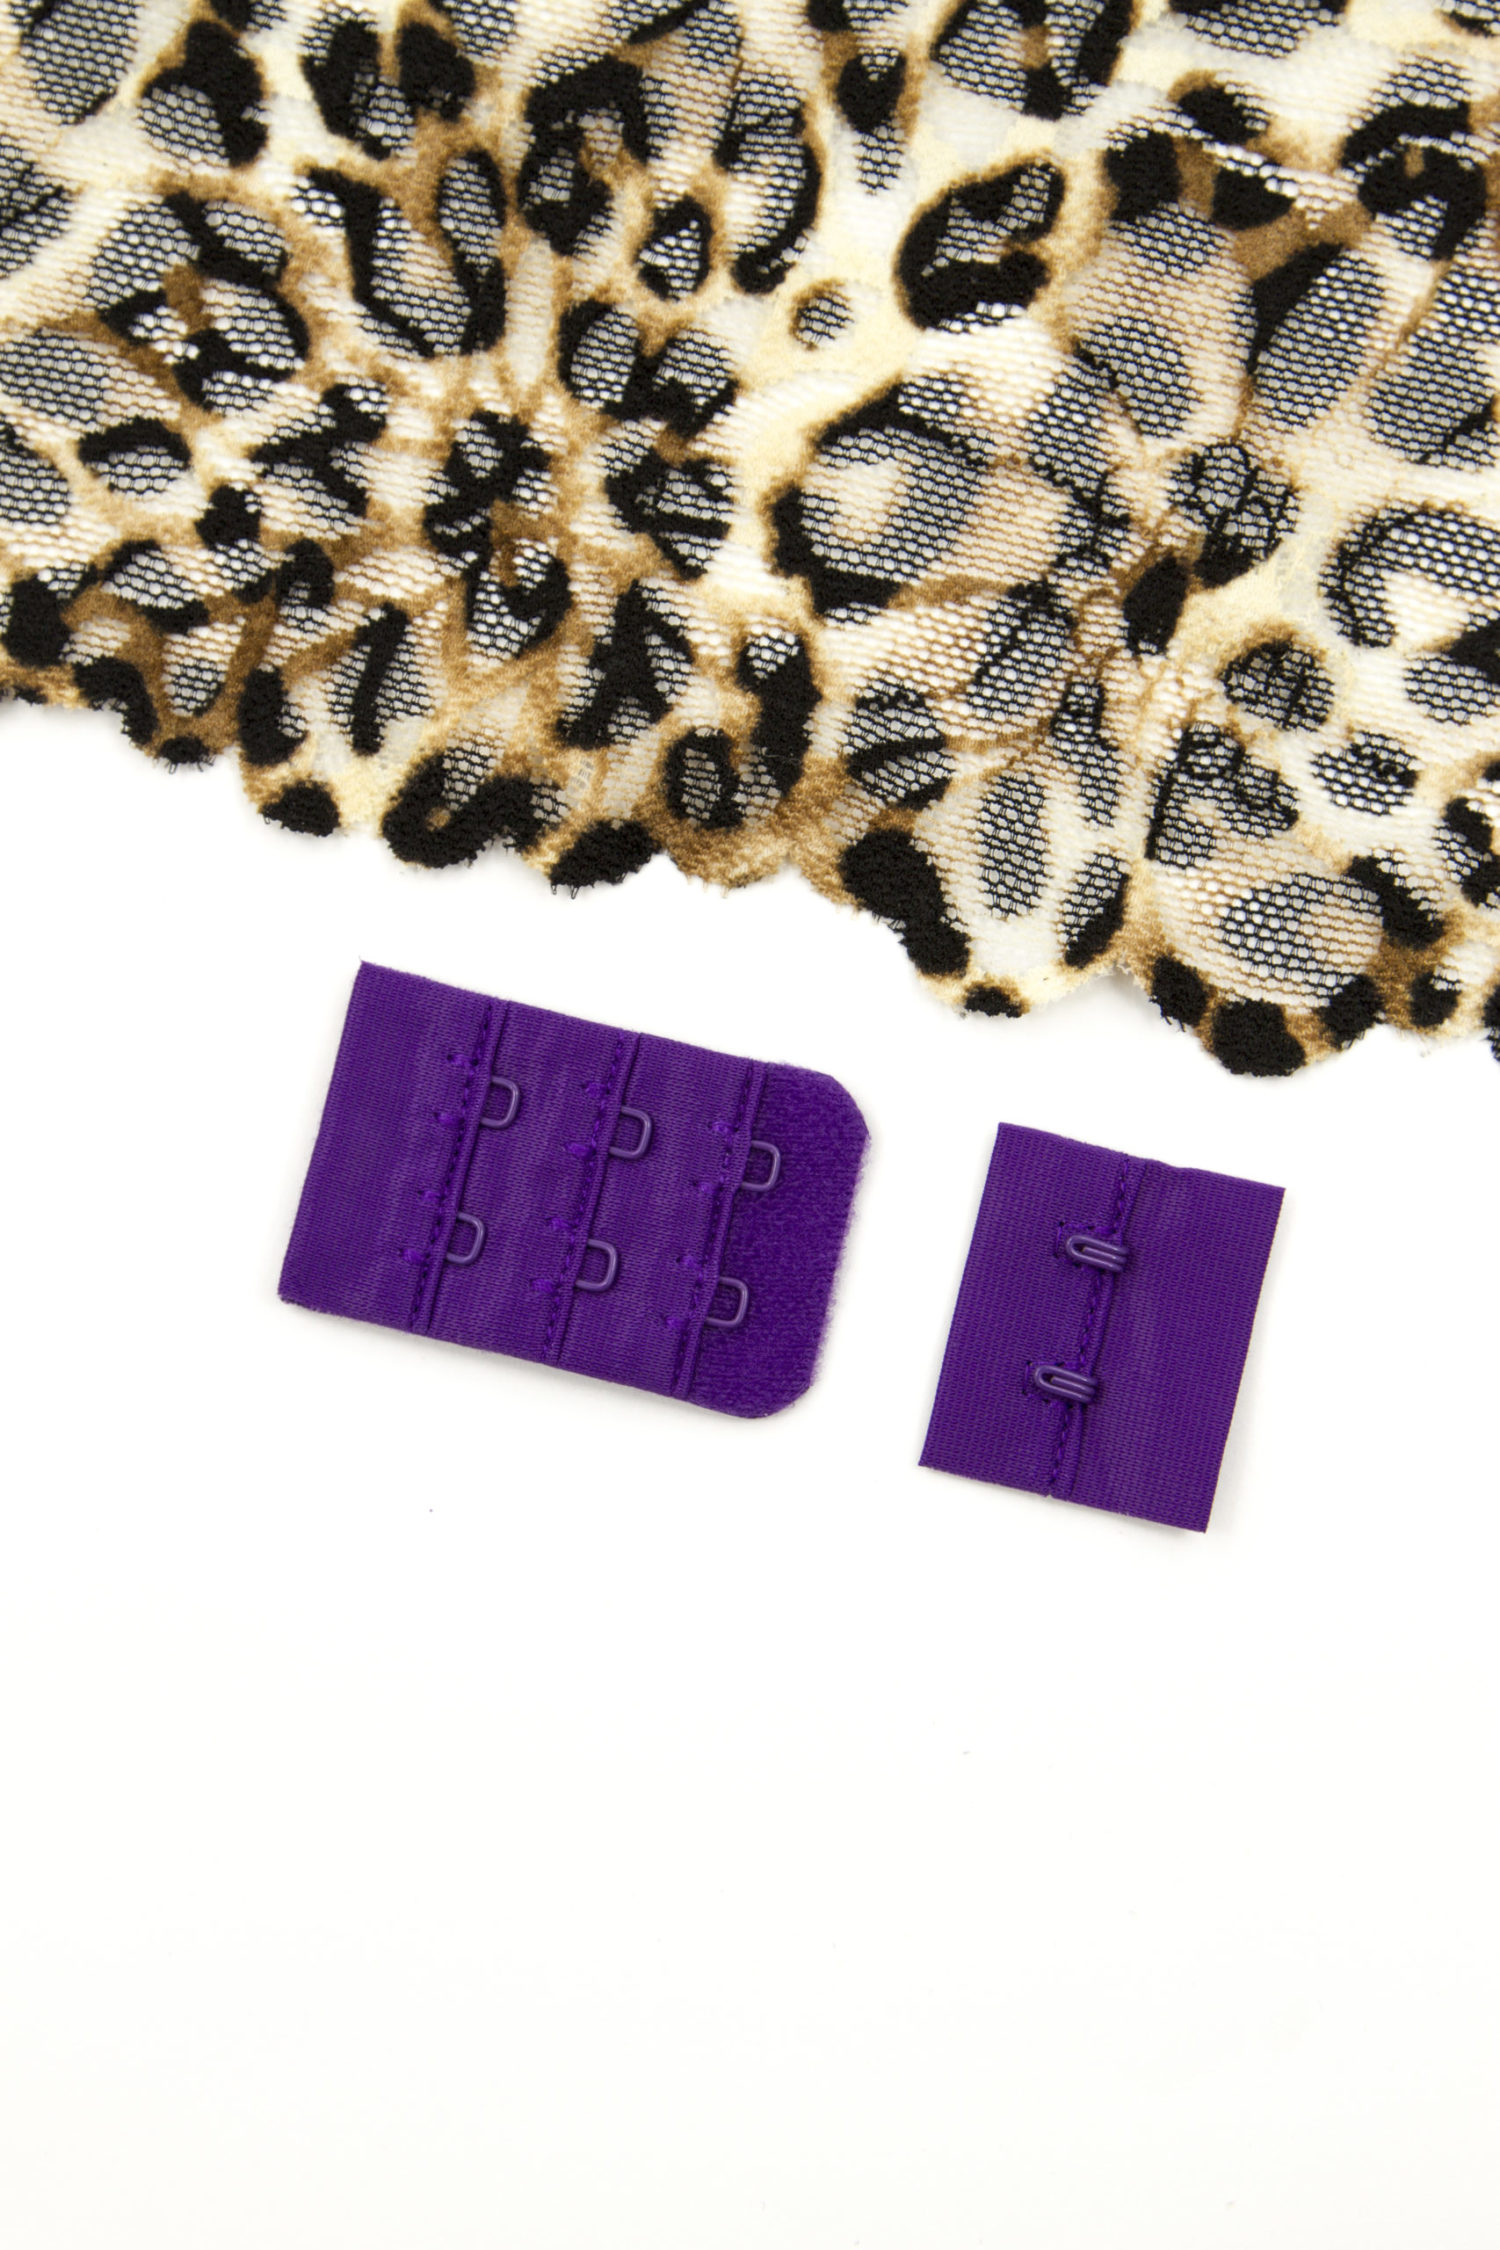 Застёжка текстильная бельевая цвета баклажан 2х3